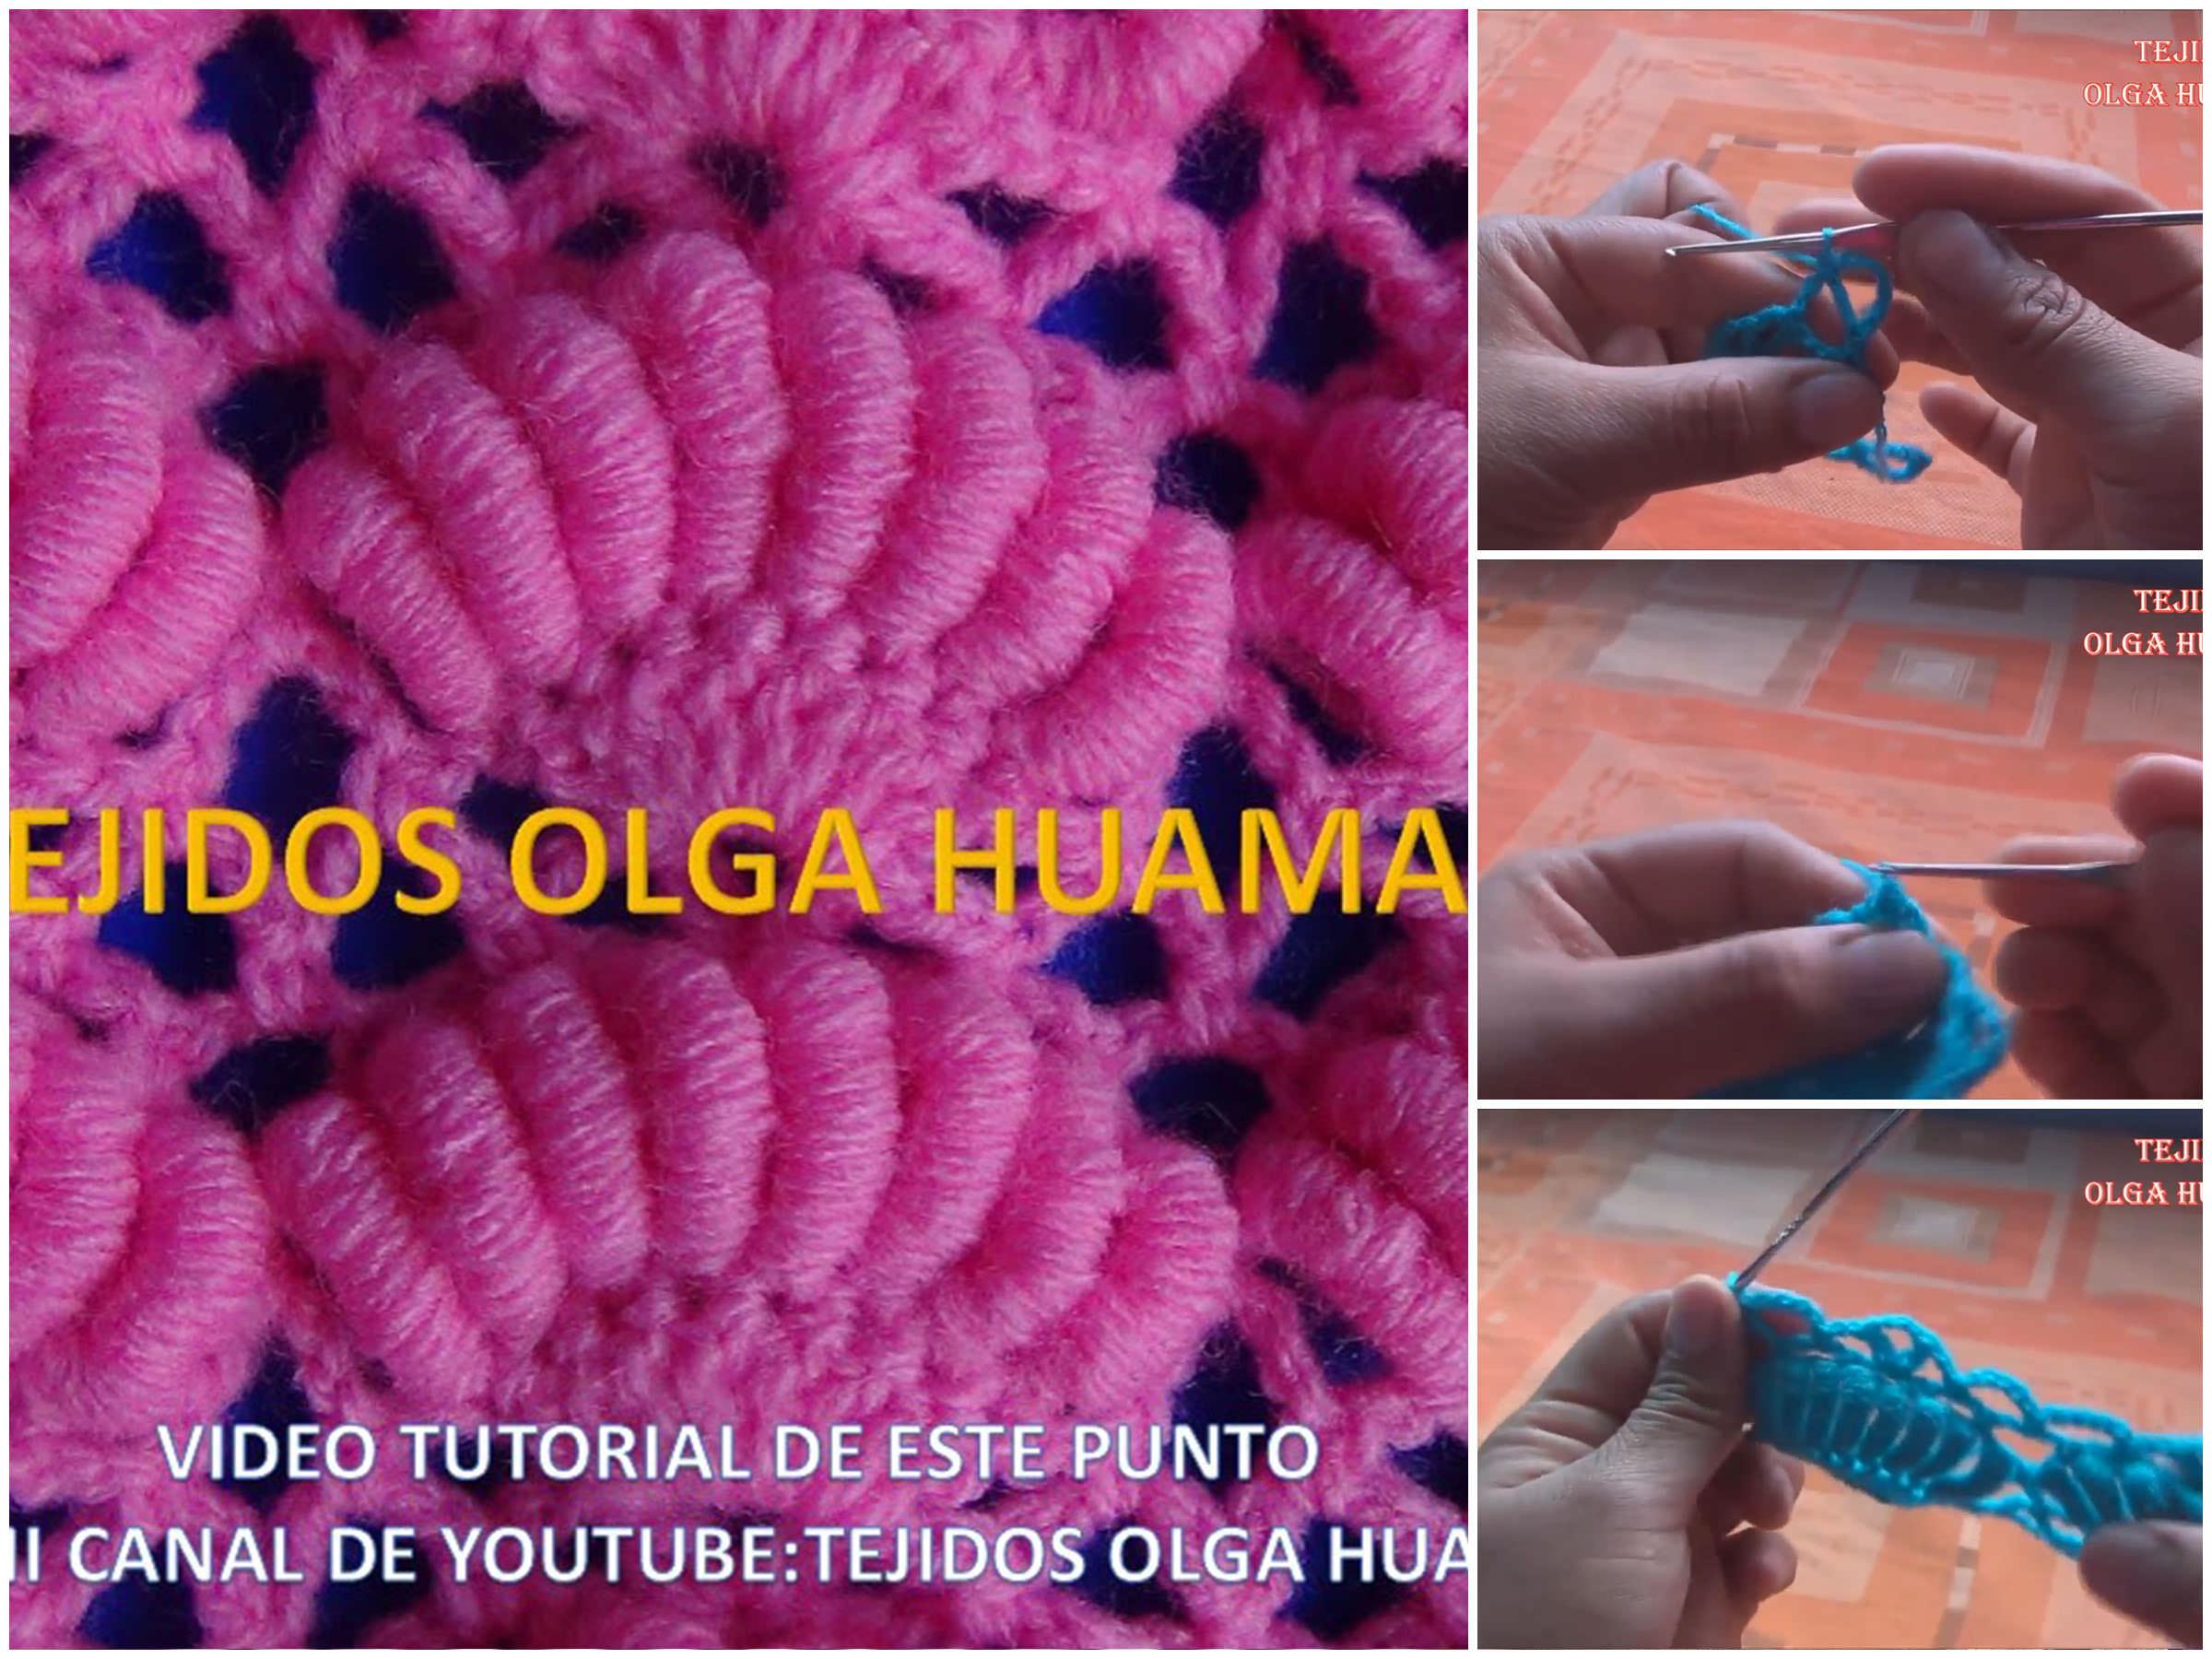 Crochet amazing baby blanket video tutorial crochetbeja crochet amazing baby blanket video tutorial baditri Image collections